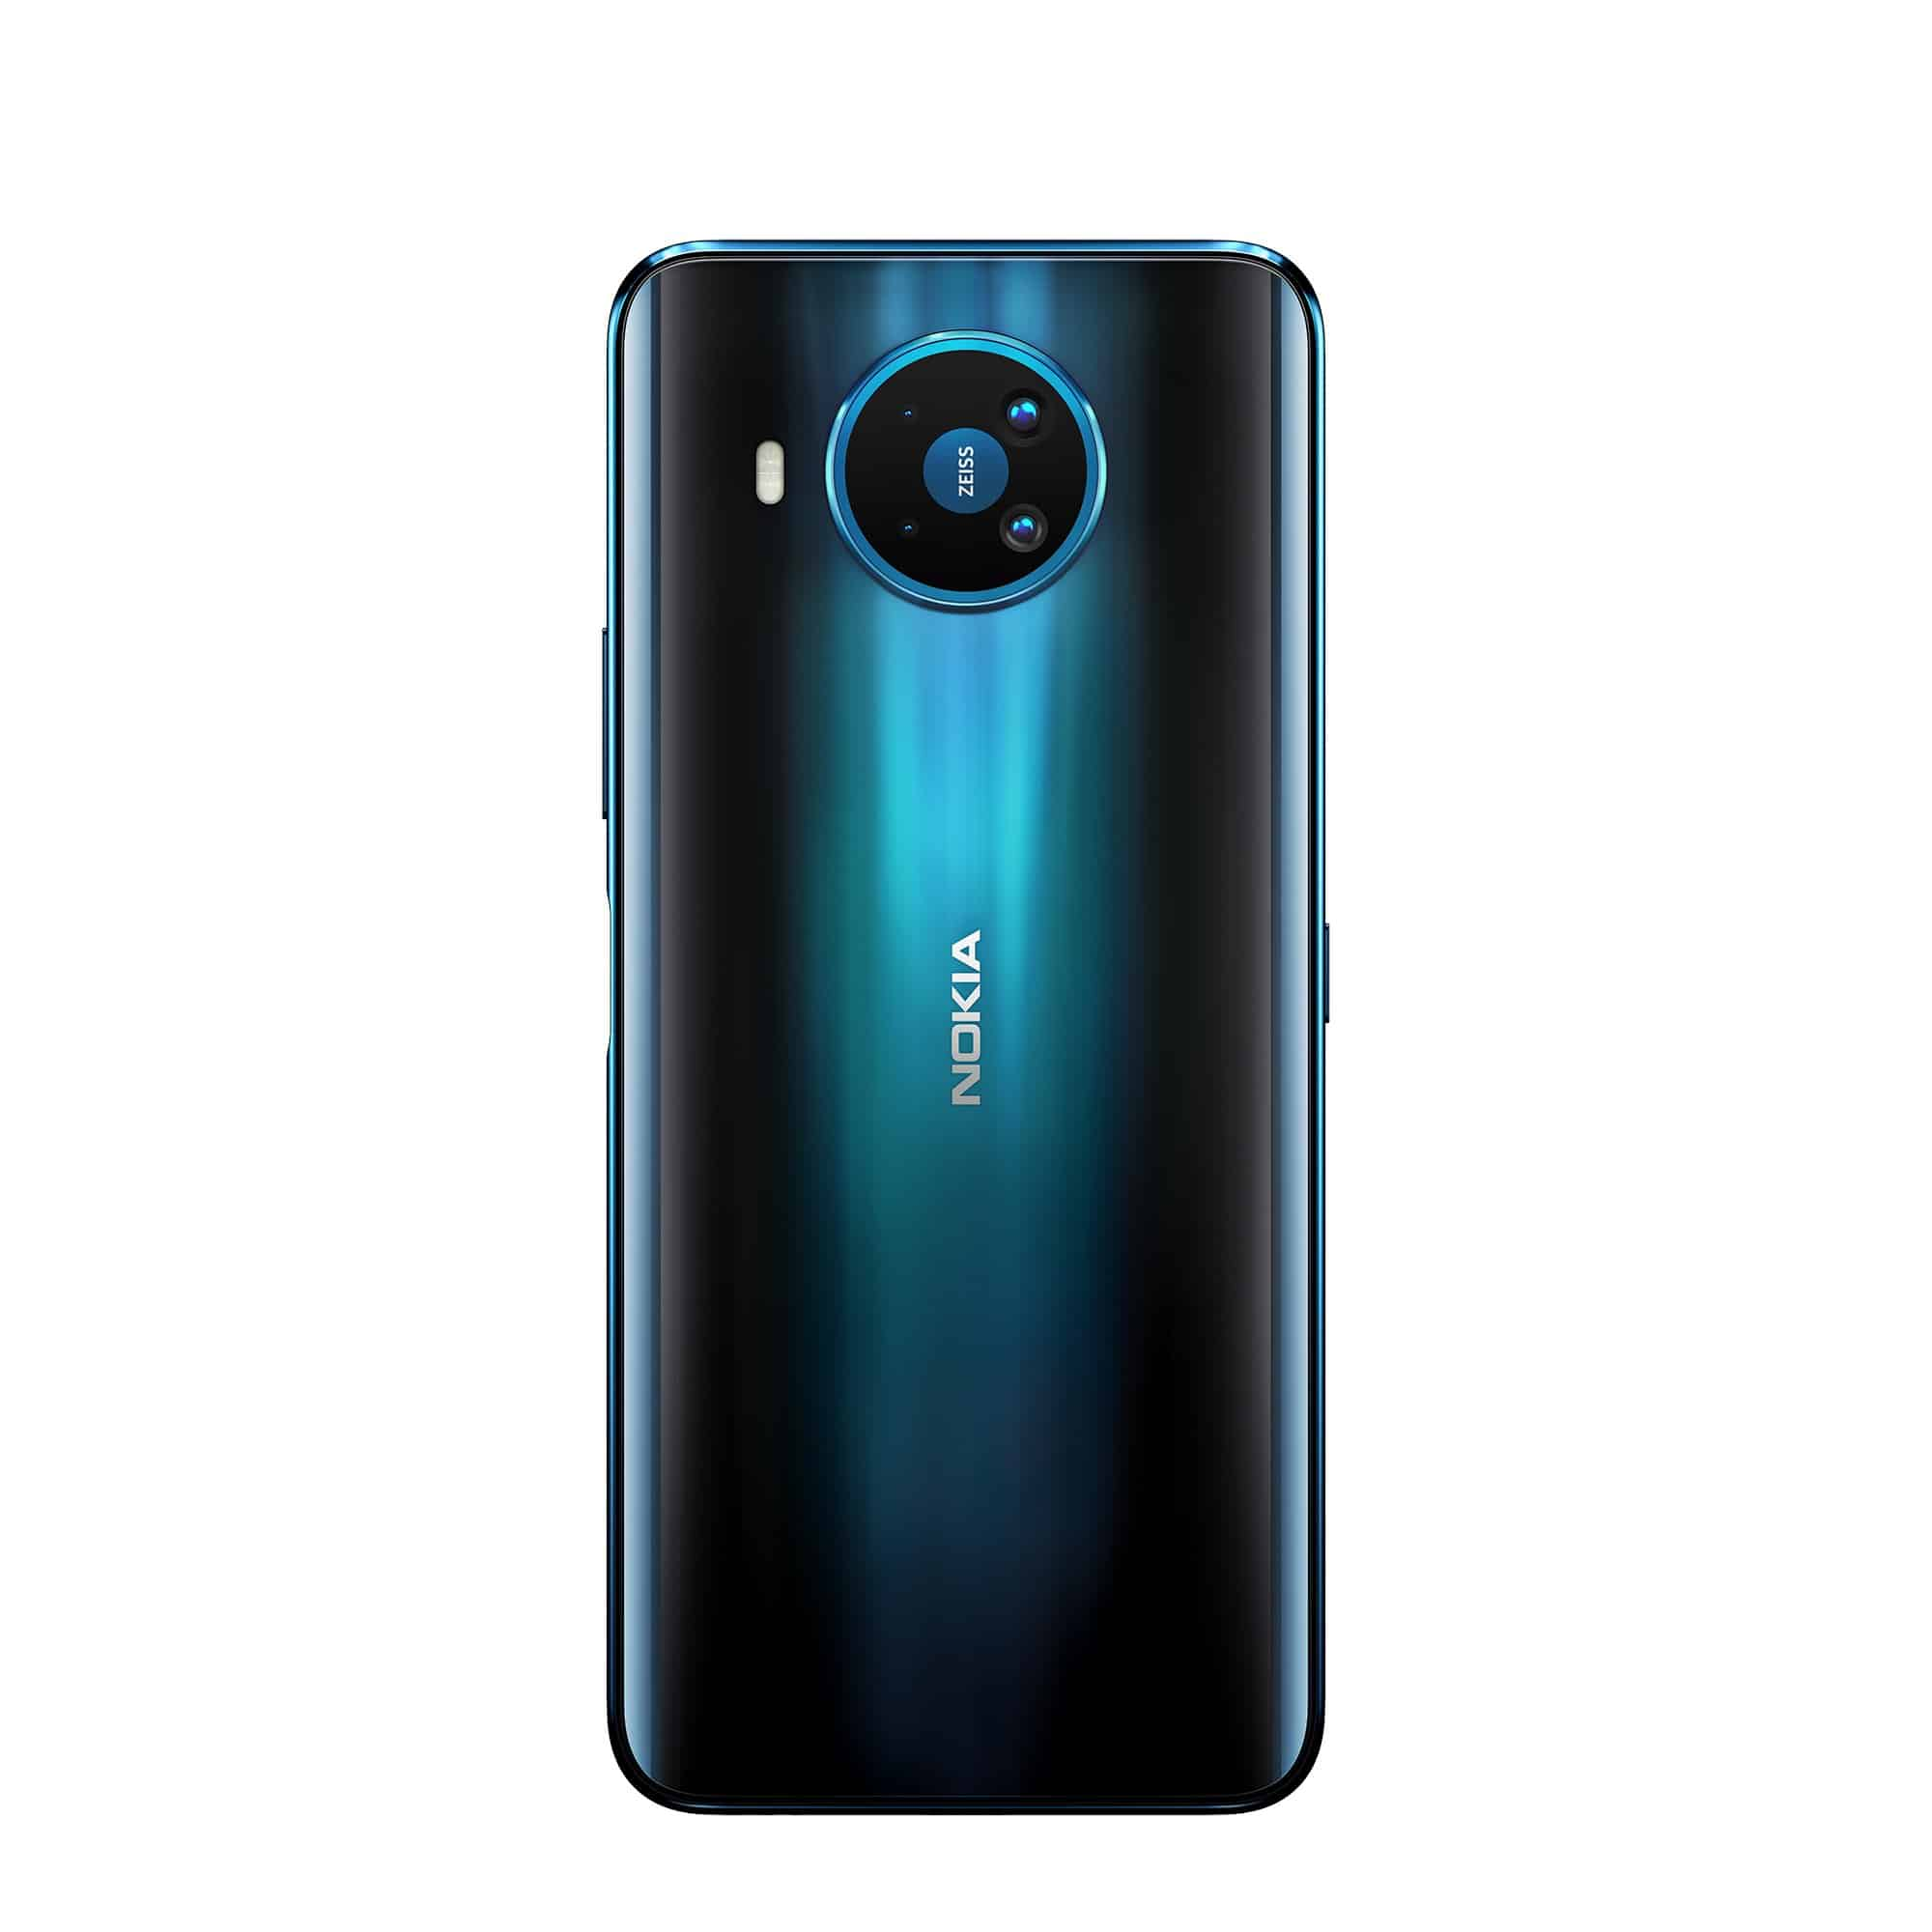 Nokia 8 3 5G image 1